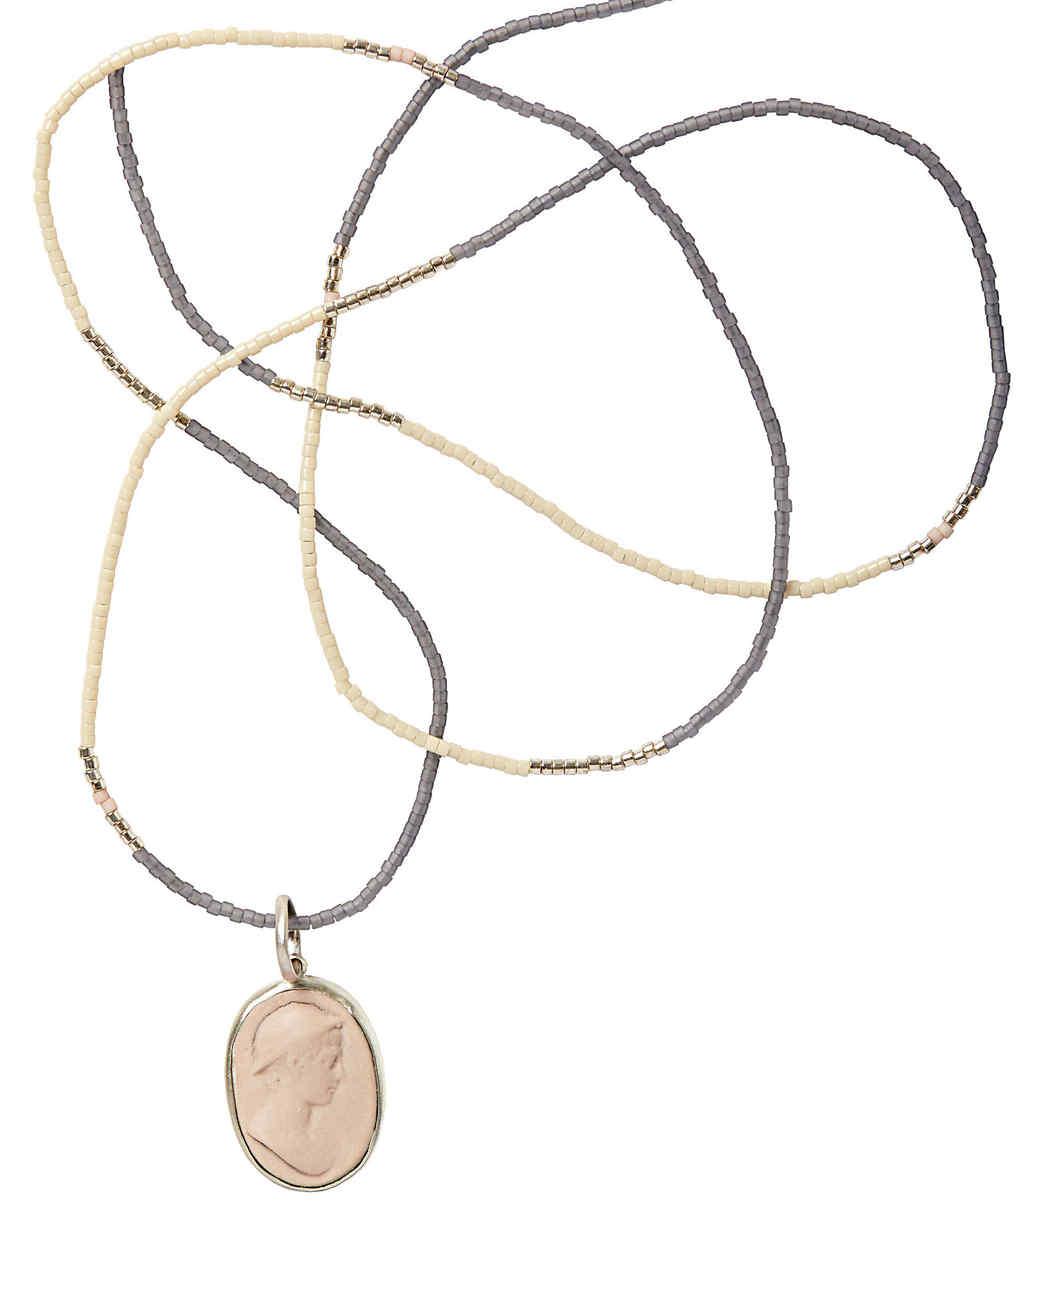 Marcie McGoldrick porcelain cameo necklace